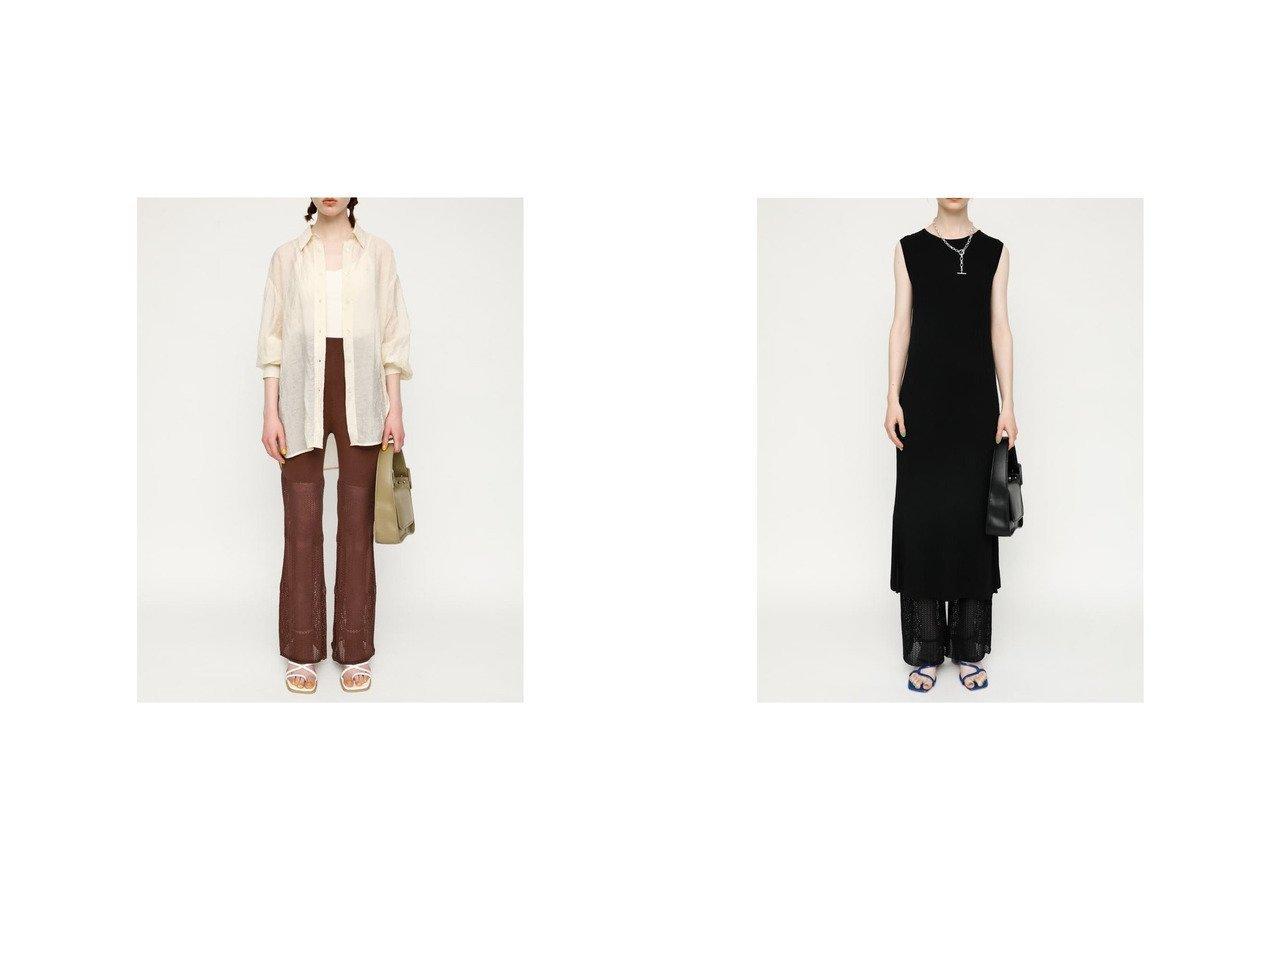 【SLY/スライ】のSUMMER YARN パンツ&SUMMER YARN ワンピース おすすめ!人気トレンド・レディースファッション通販 おすすめで人気の流行・トレンド、ファッションの通販商品 インテリア・家具・メンズファッション・キッズファッション・レディースファッション・服の通販 founy(ファニー) https://founy.com/ ファッション Fashion レディースファッション WOMEN パンツ Pants ワンピース Dress 2021年 2021 2021春夏・S/S SS/Spring/Summer/2021 S/S・春夏 SS・Spring/Summer おすすめ Recommend クロシェ セットアップ ミックス 夏 Summer 春 Spring  ID:crp329100000053082